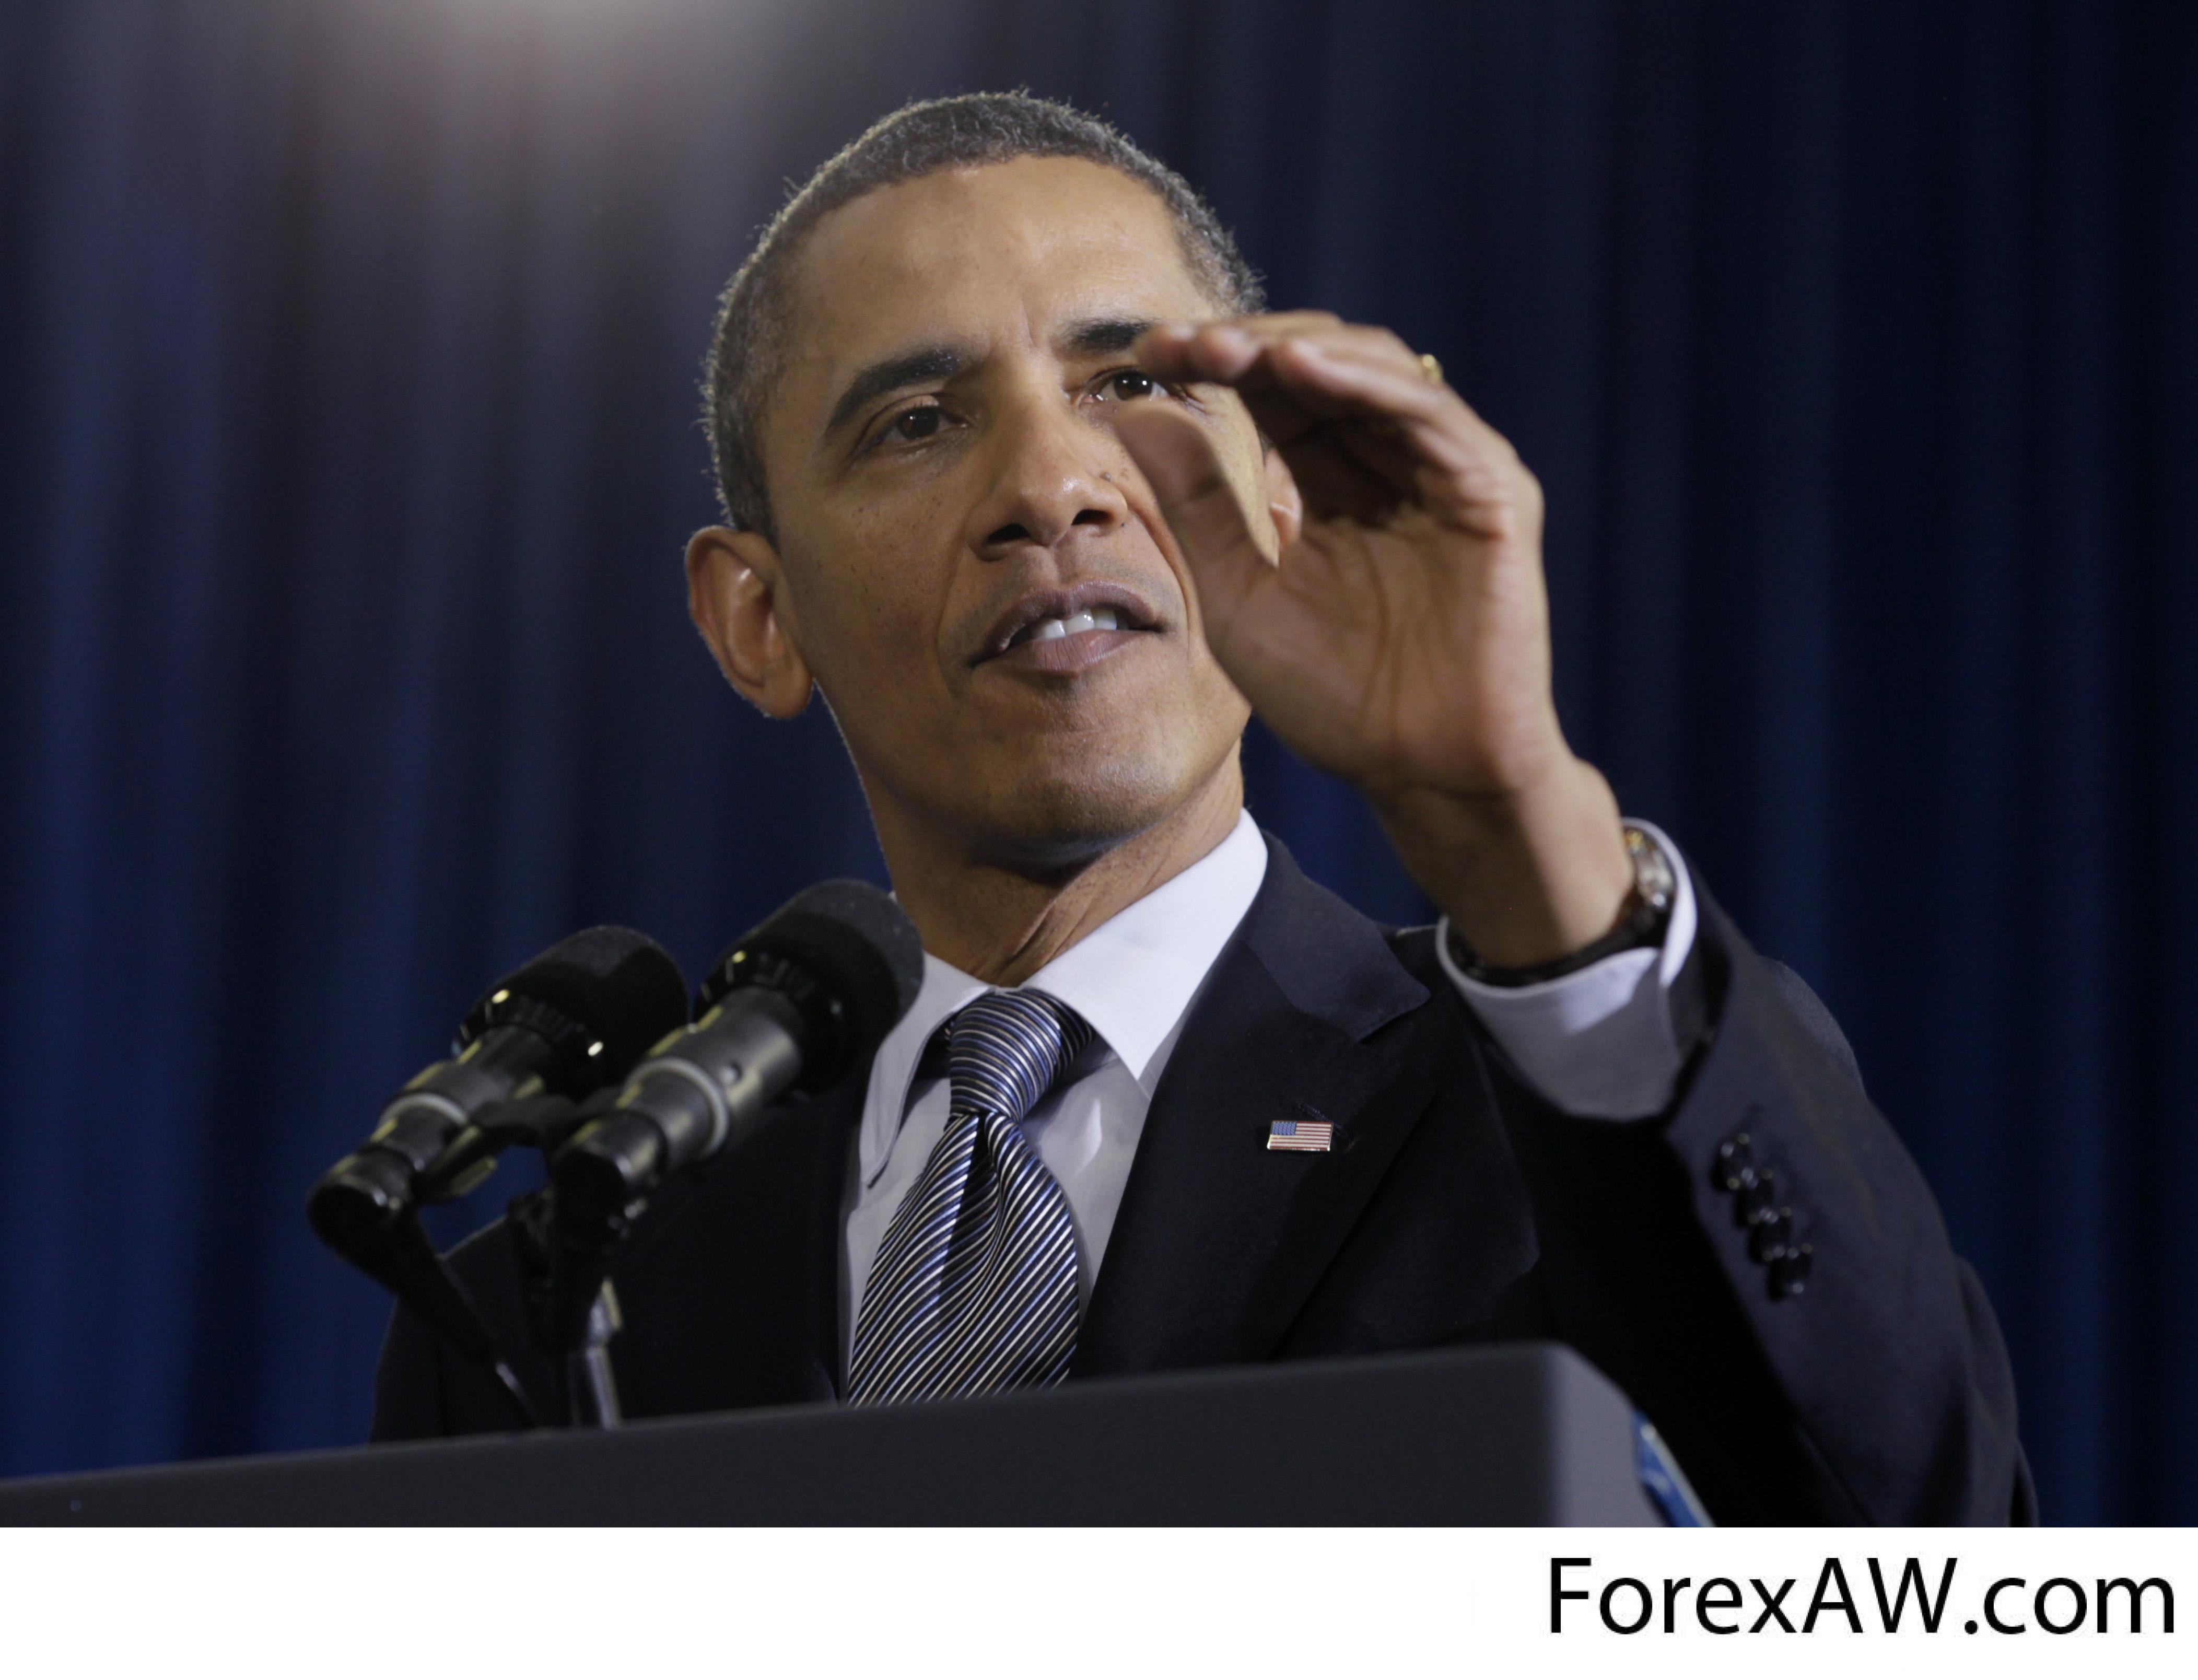 president barack obama speaks - HD1200×800